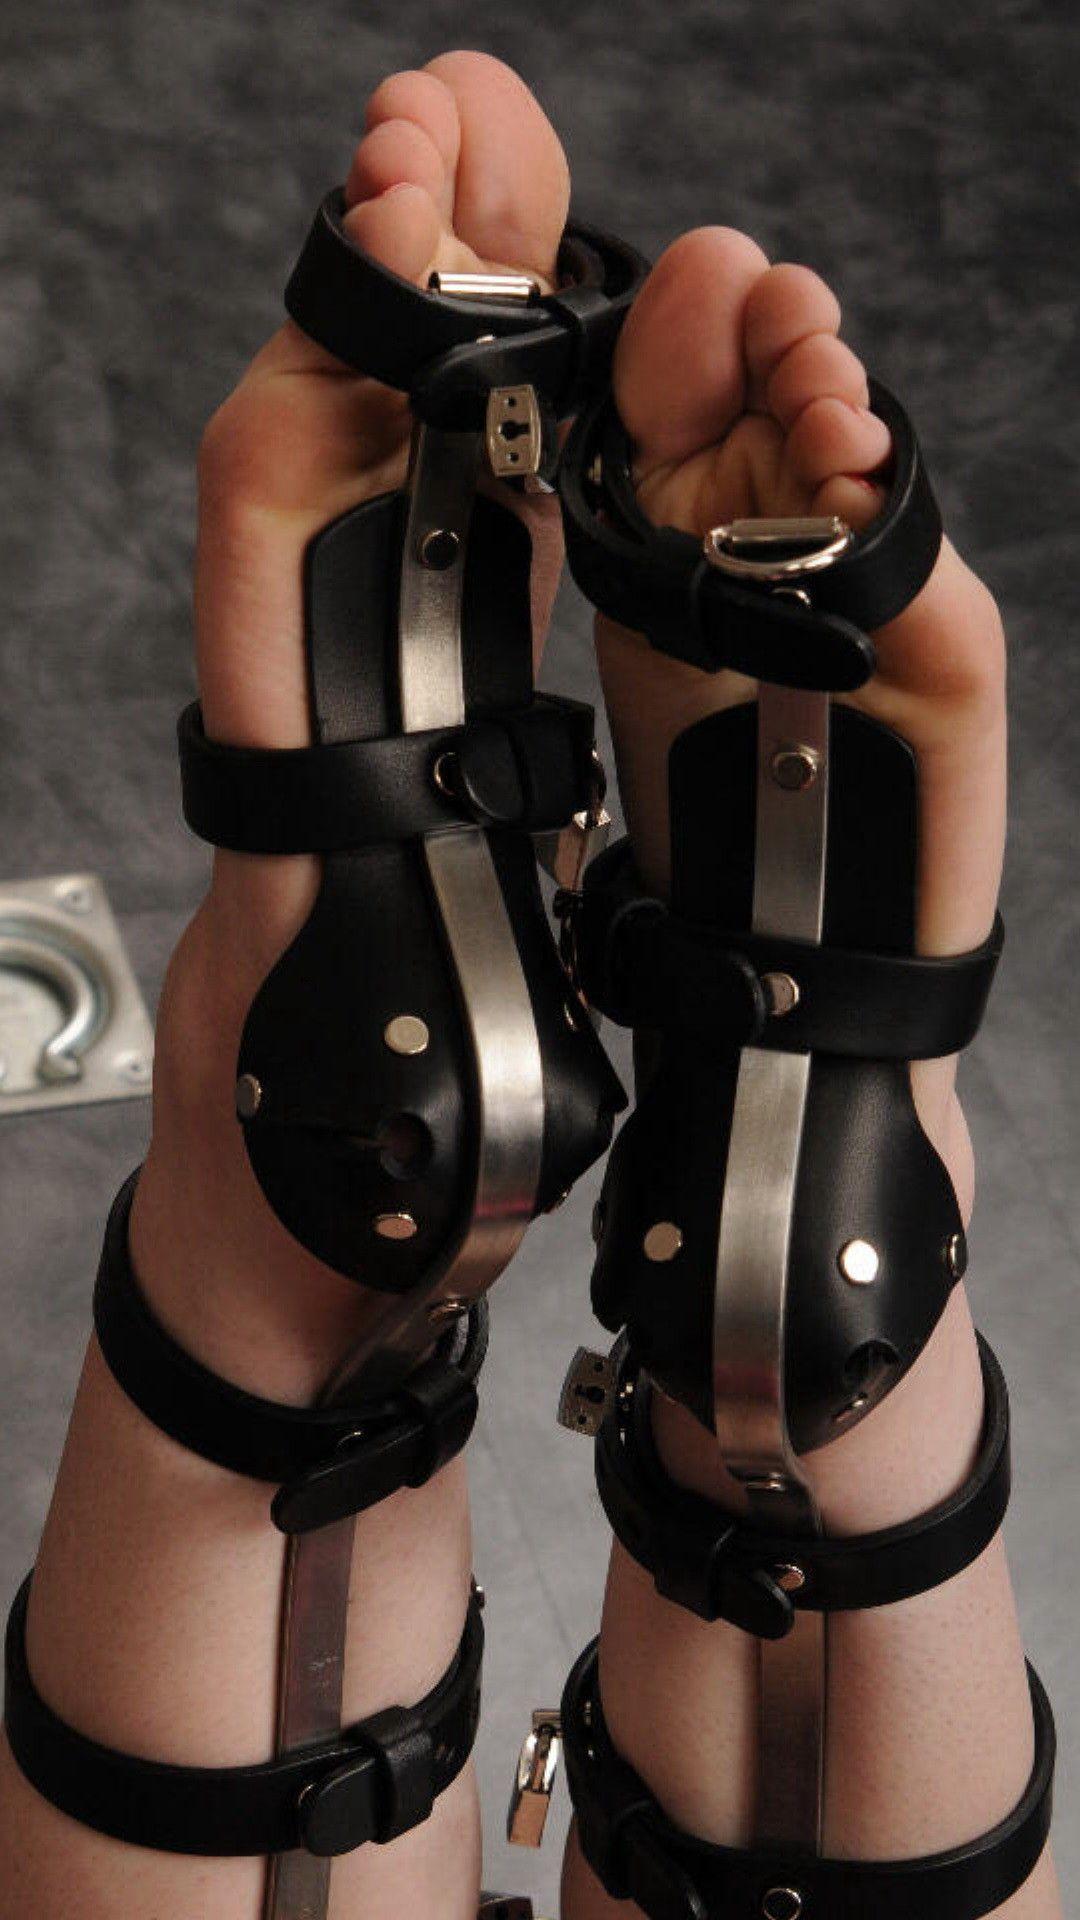 Sissy torture